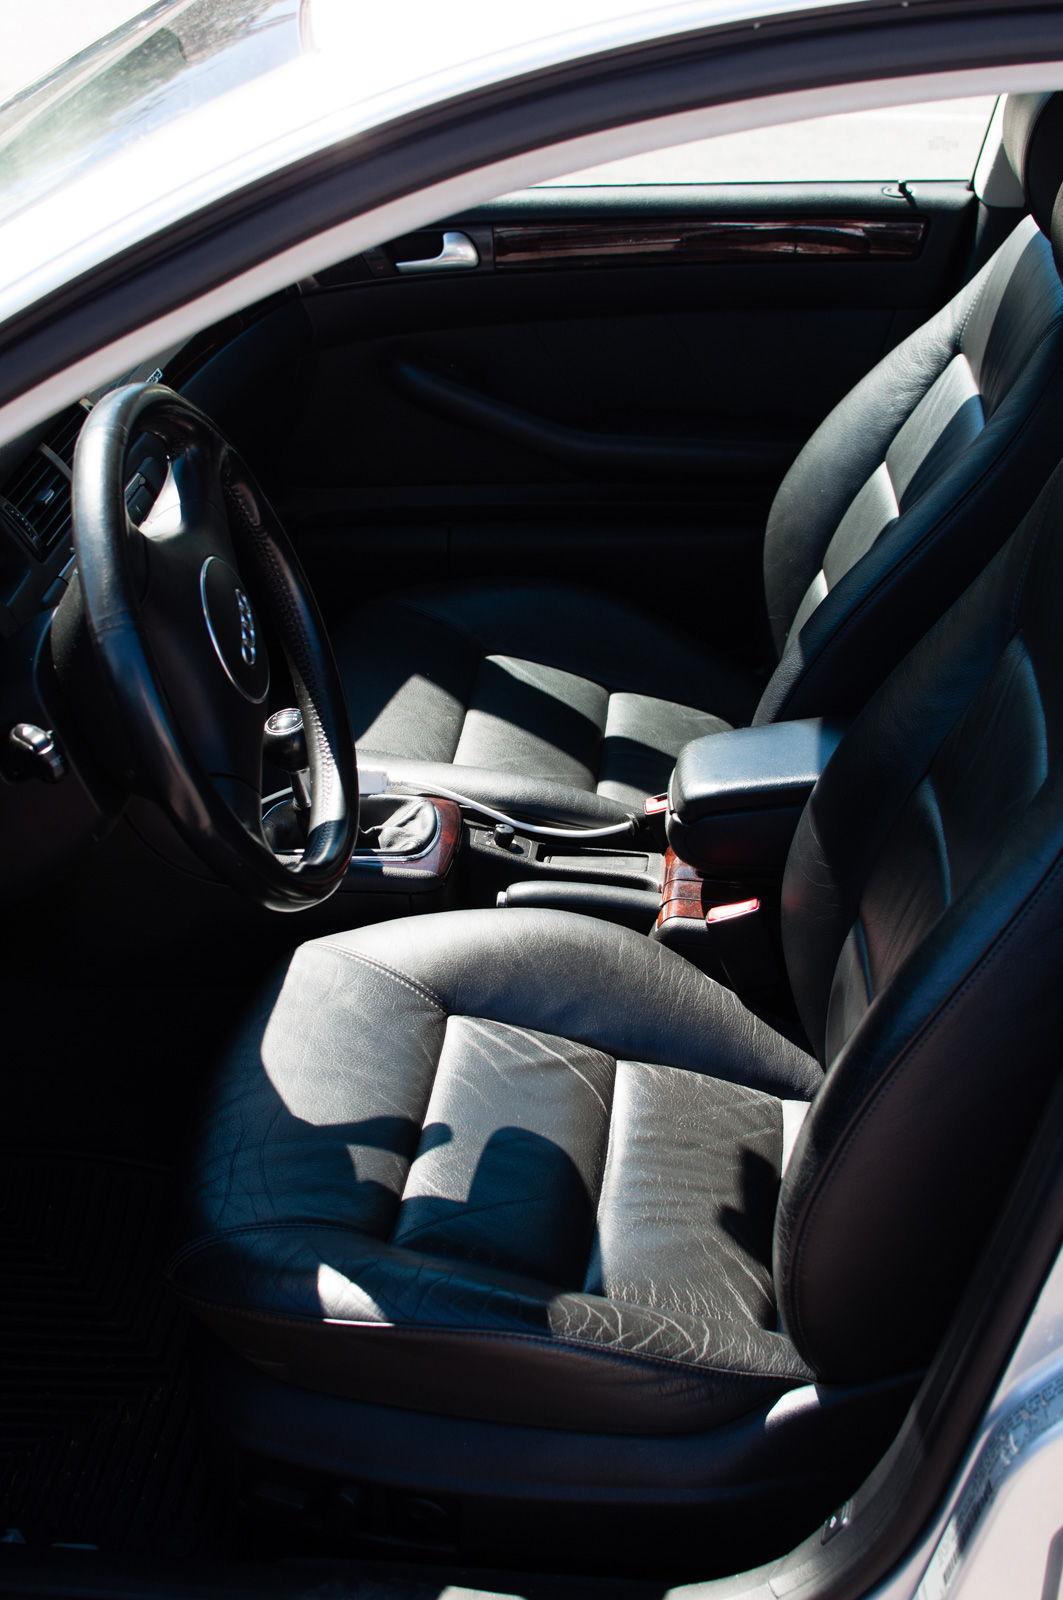 World Of Wheels Boston >> Audi A6 2003 Audi A6 2.7T 6 speed manual - Boston ...